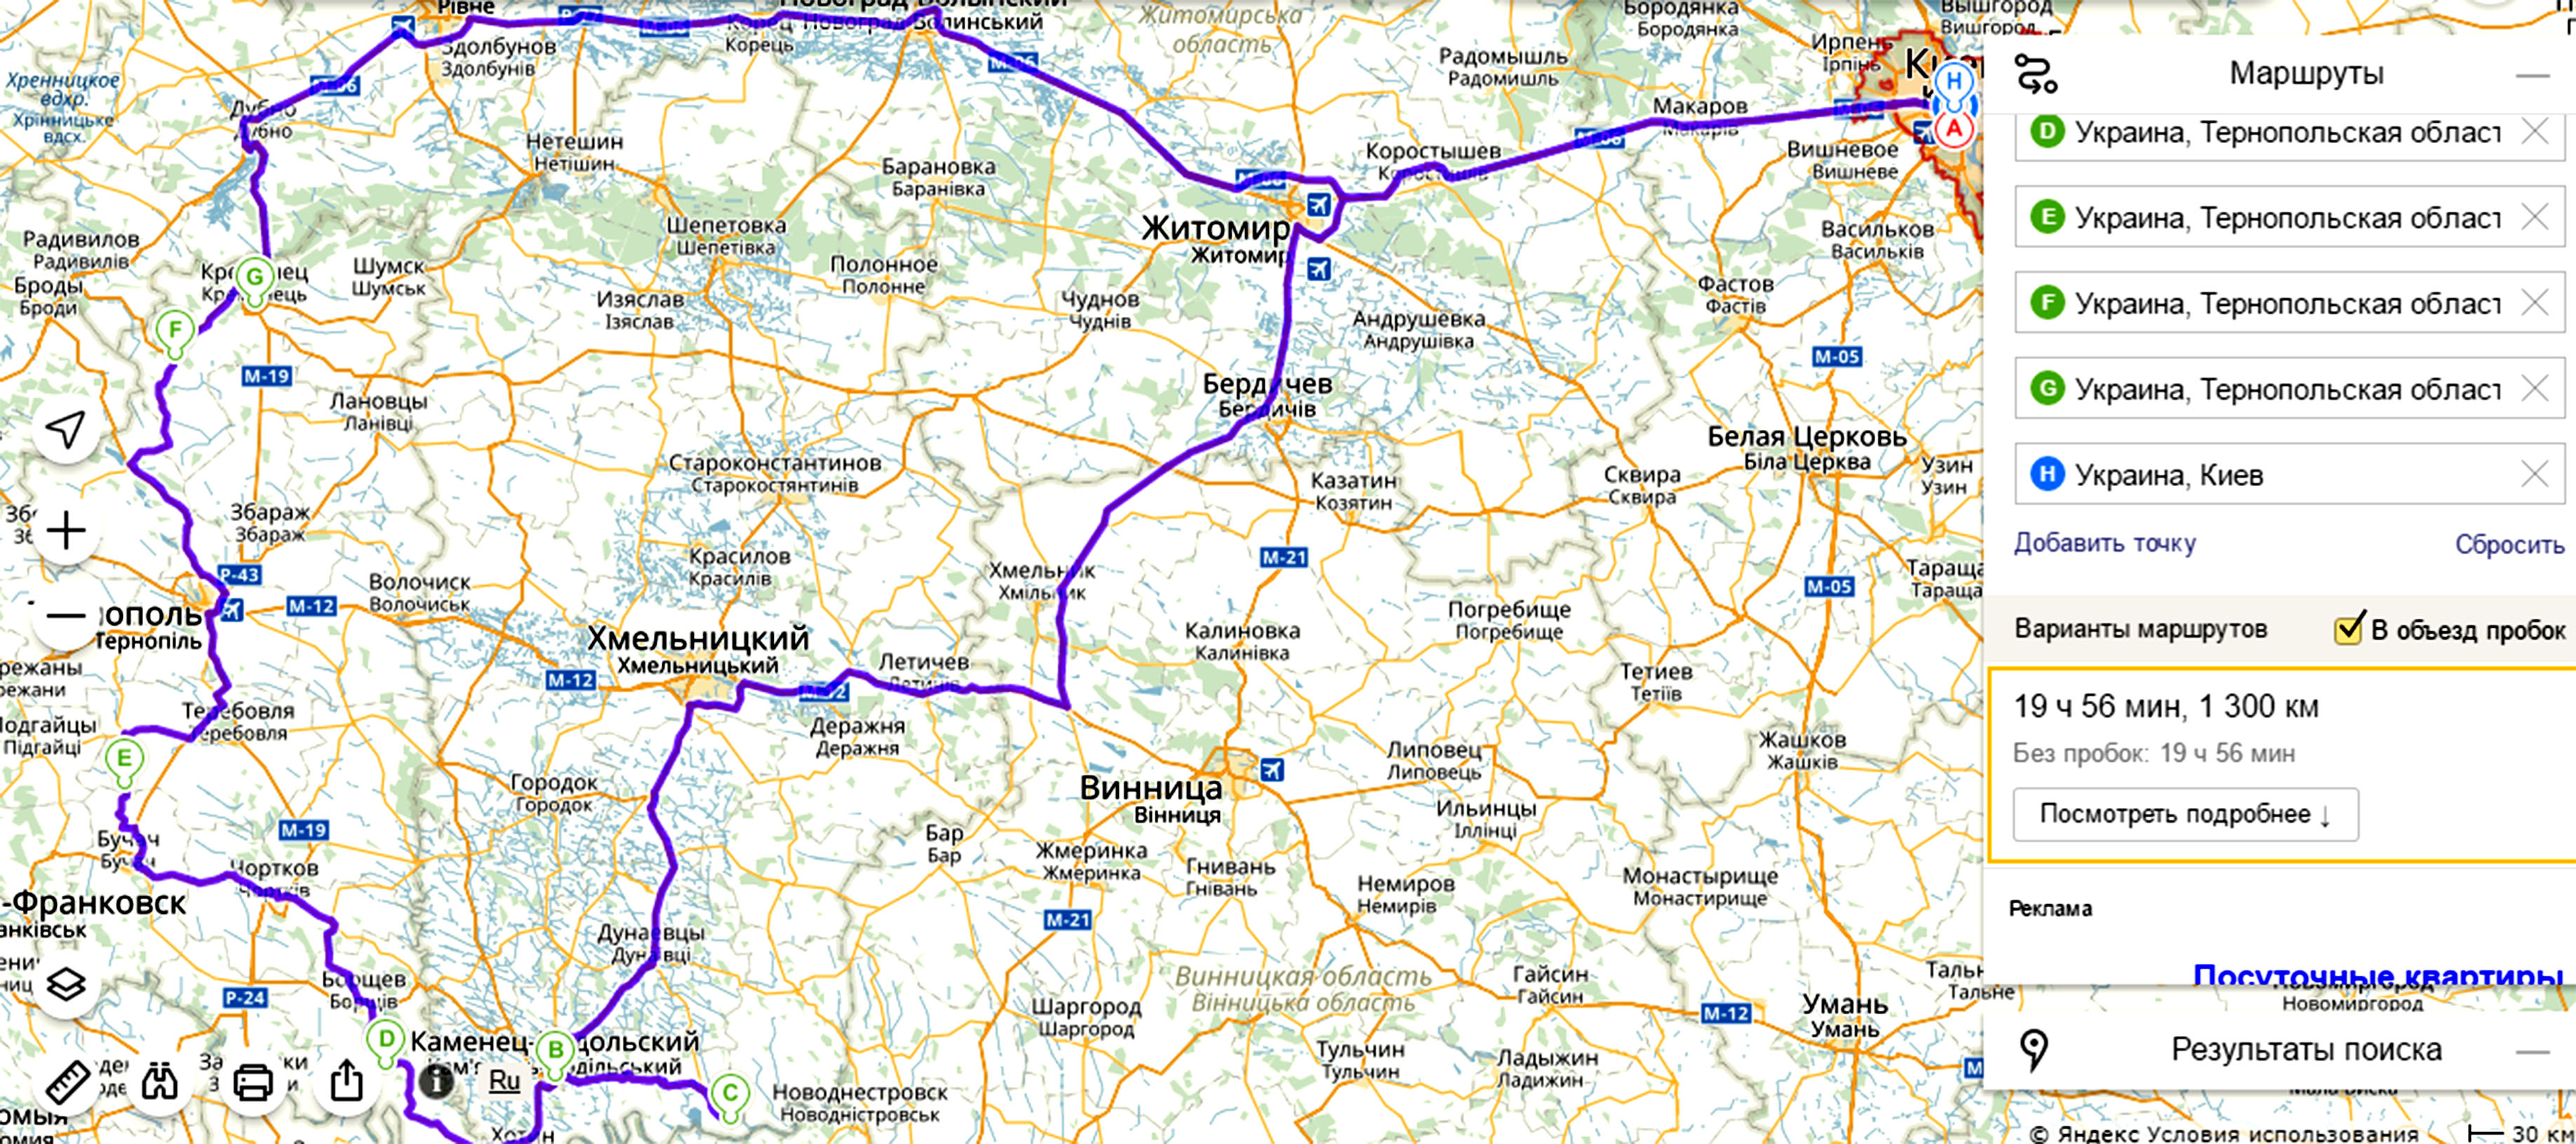 маршрут по местам силы Тернополя